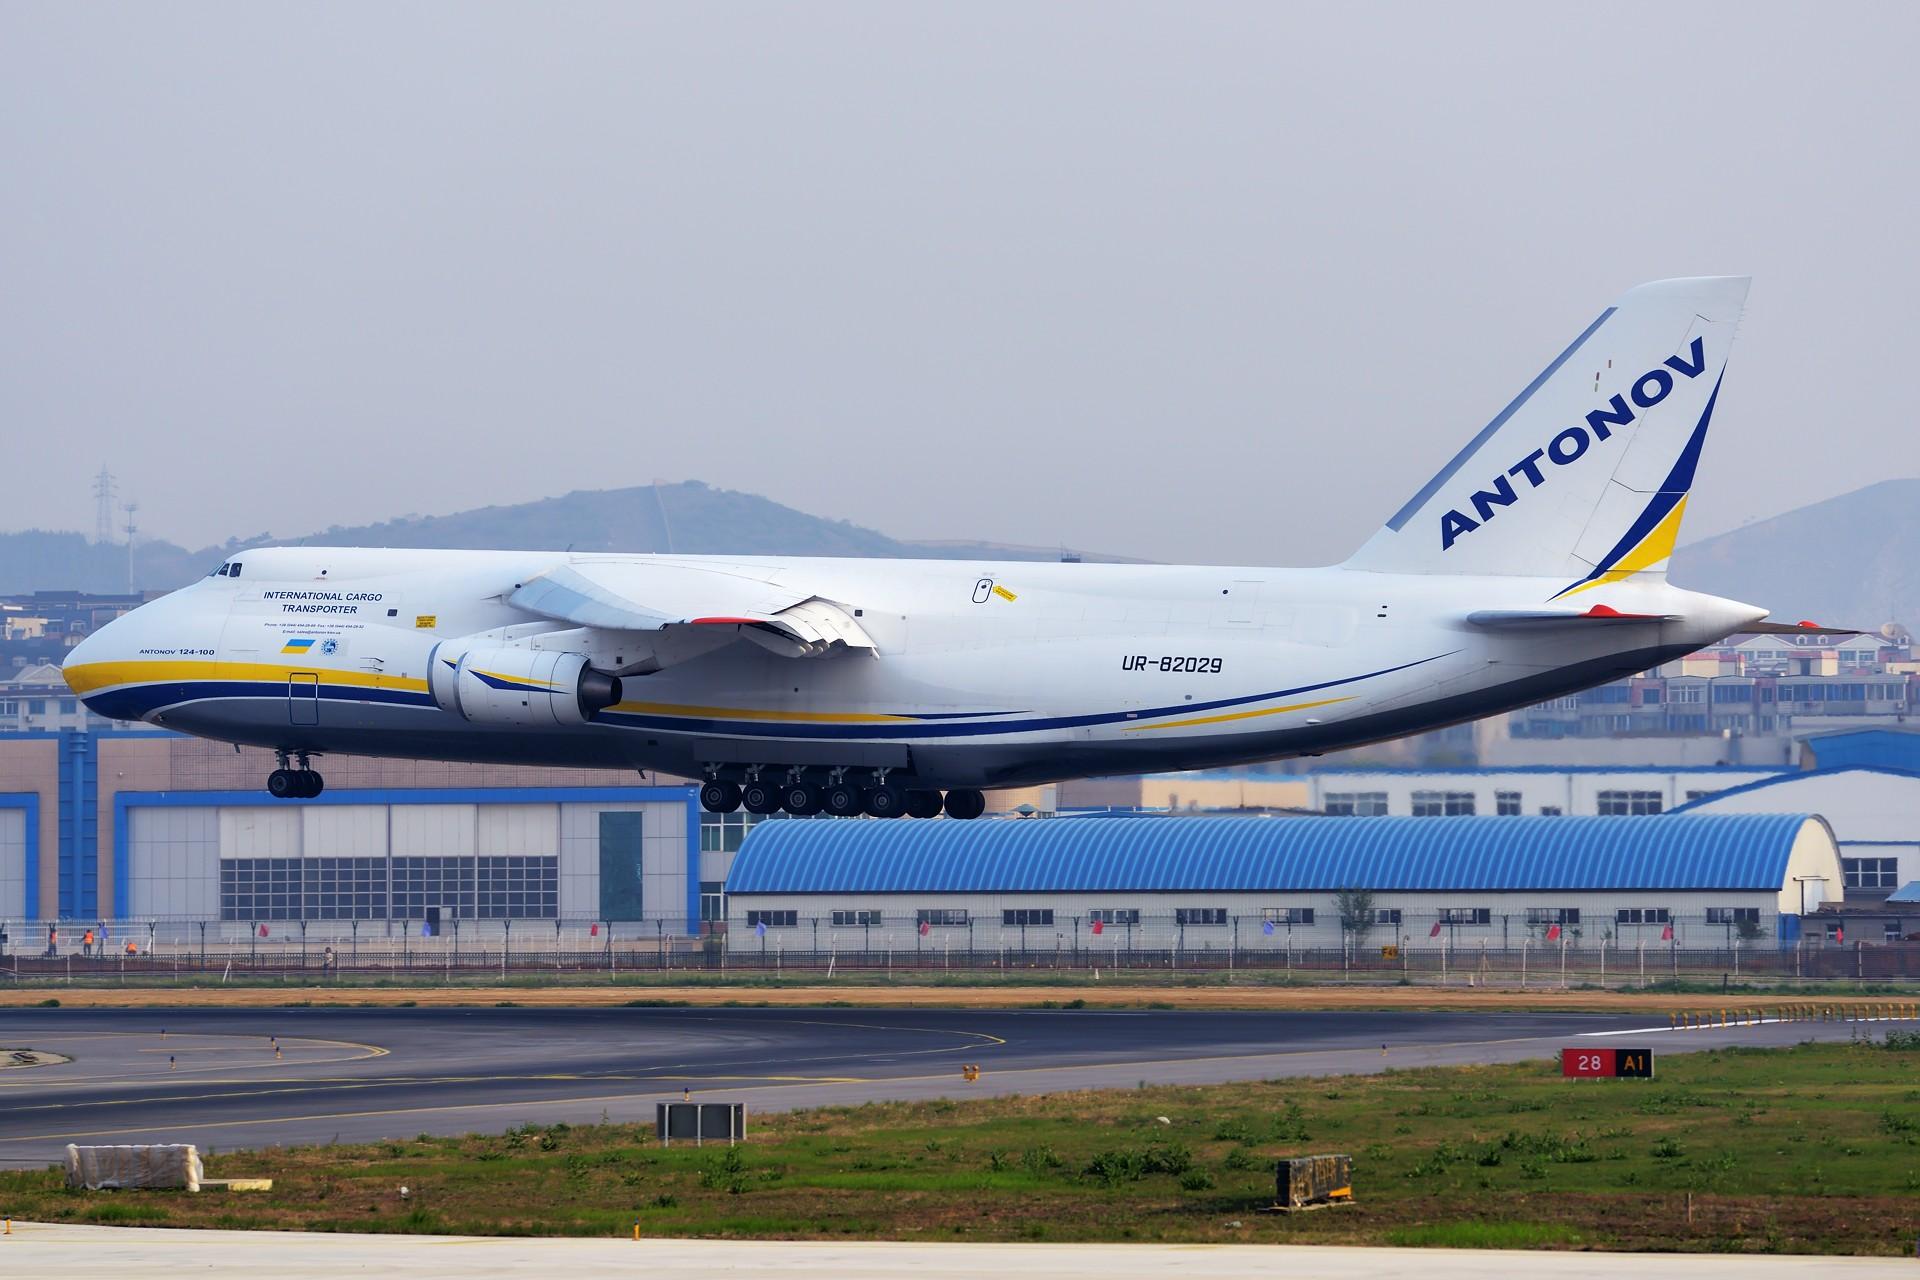 Re:[原创]★[DLC]2016年终总结(持续更新中)★ ANTONOV AN-124 UR-82029 中国大连国际机场